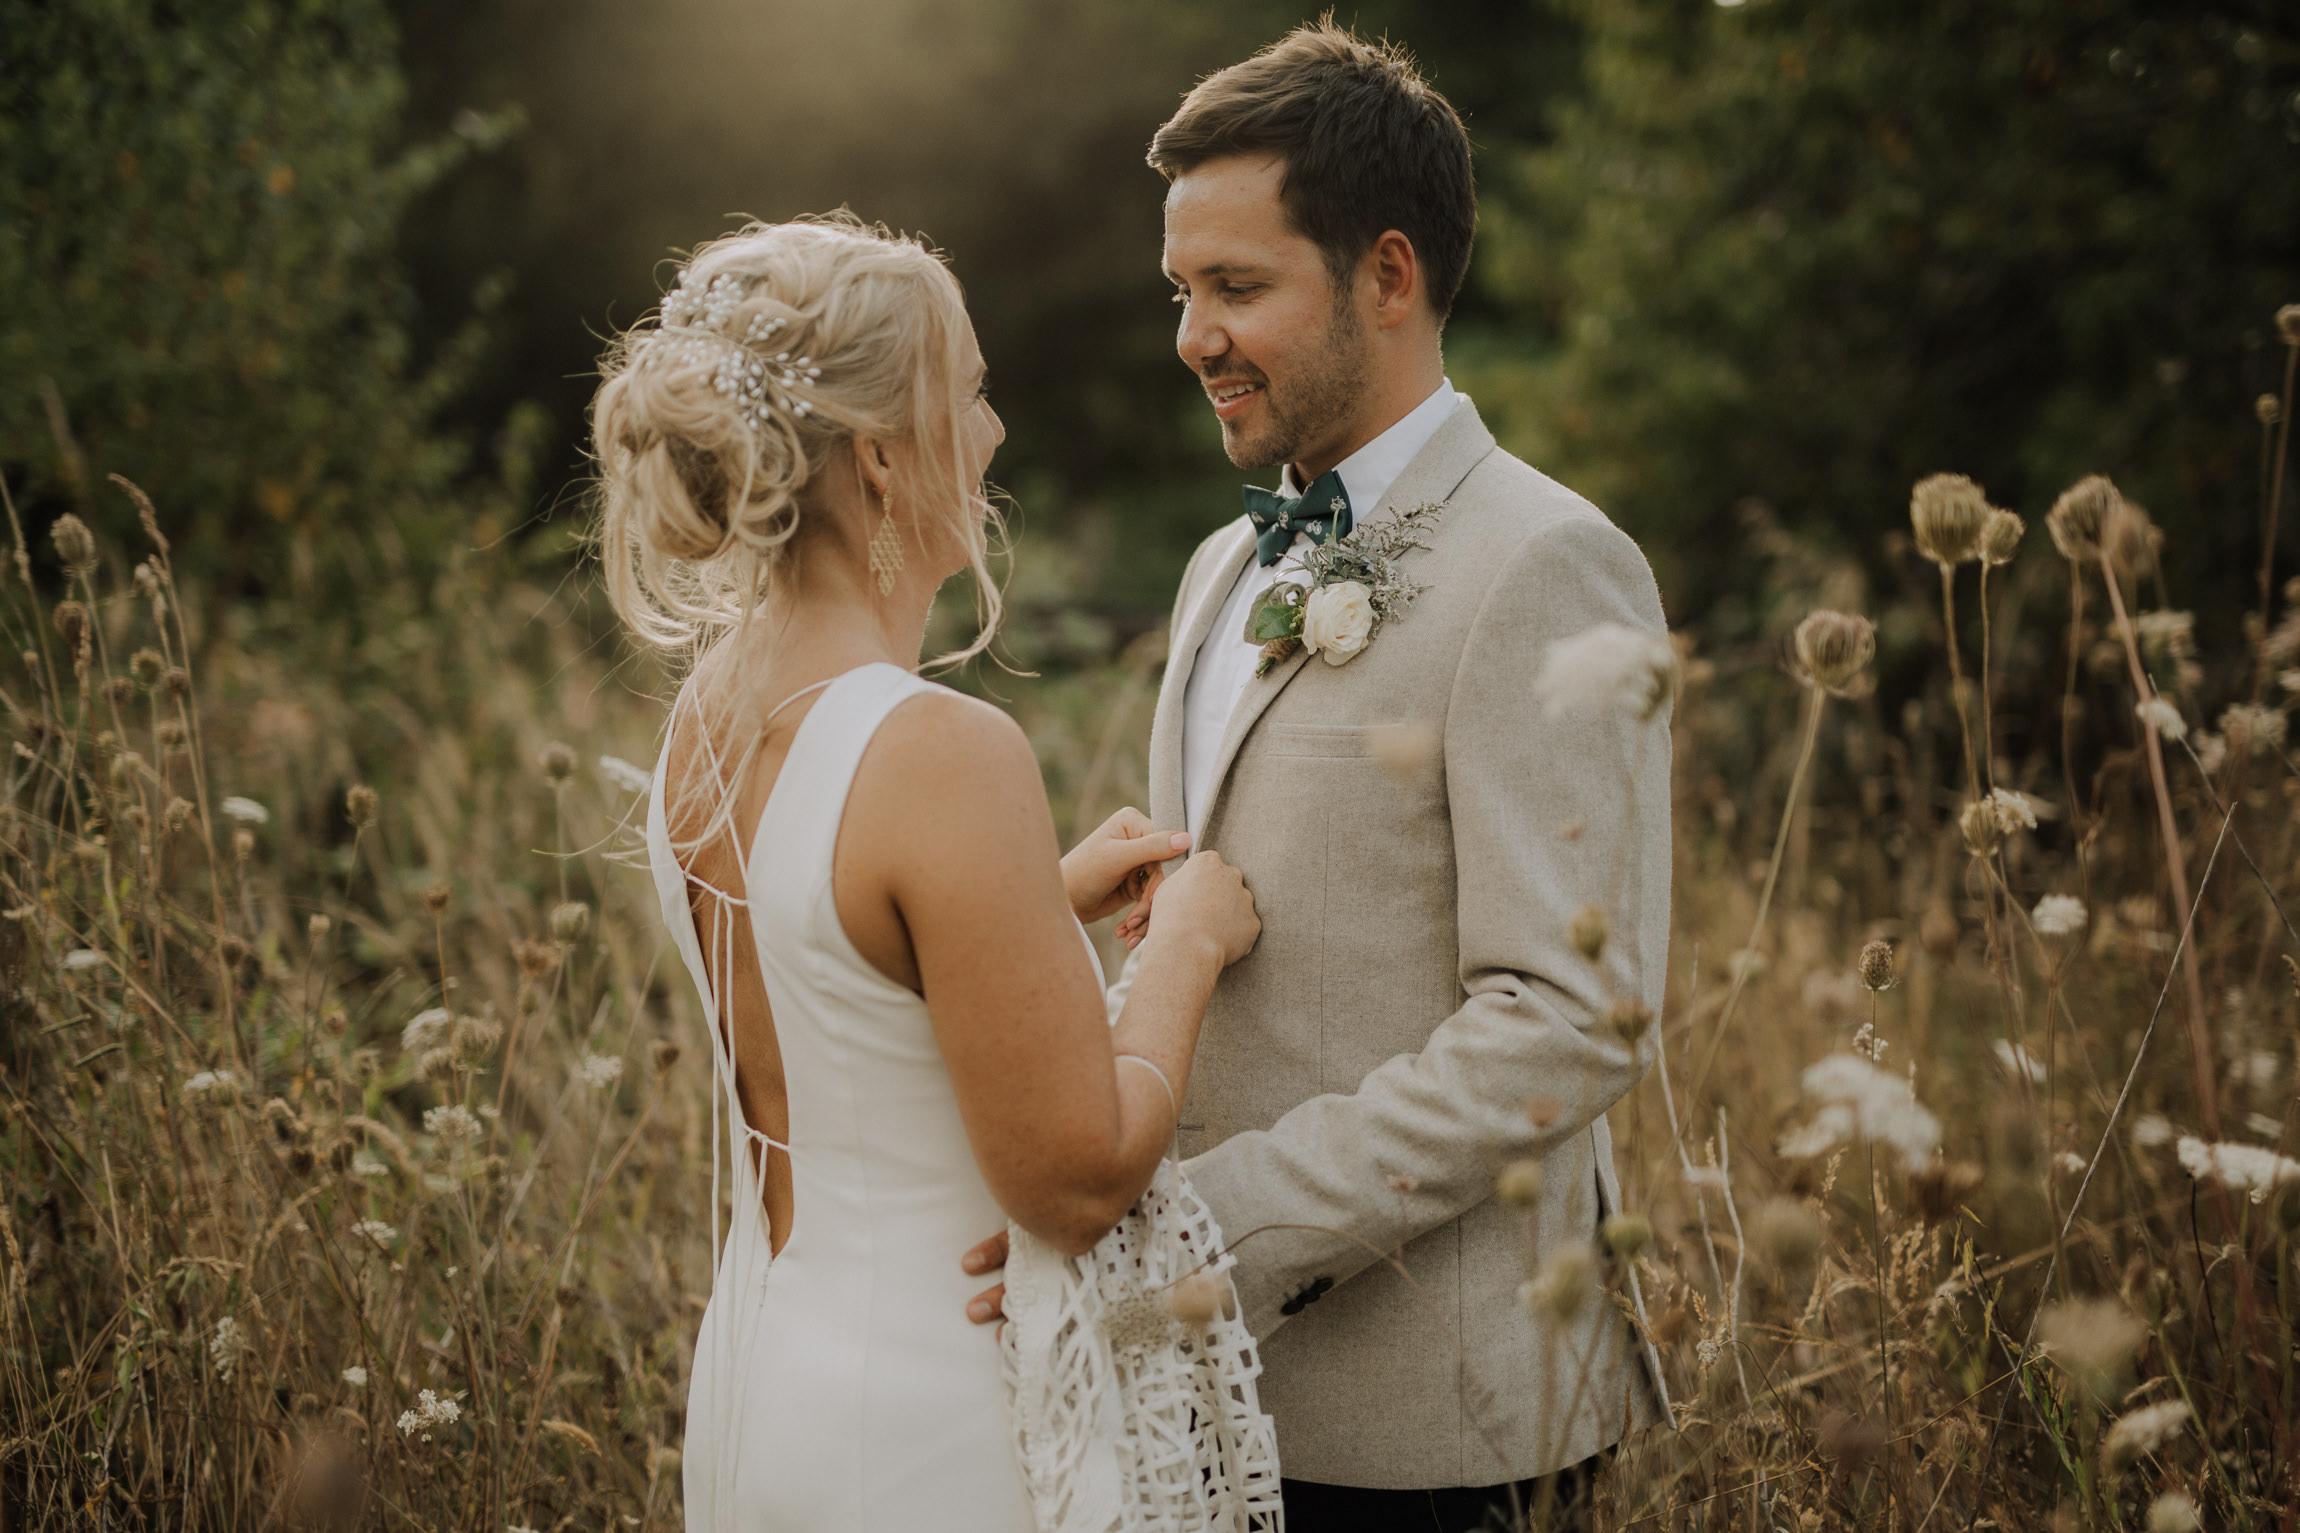 oldforestschool-wedding-blog-163.jpg